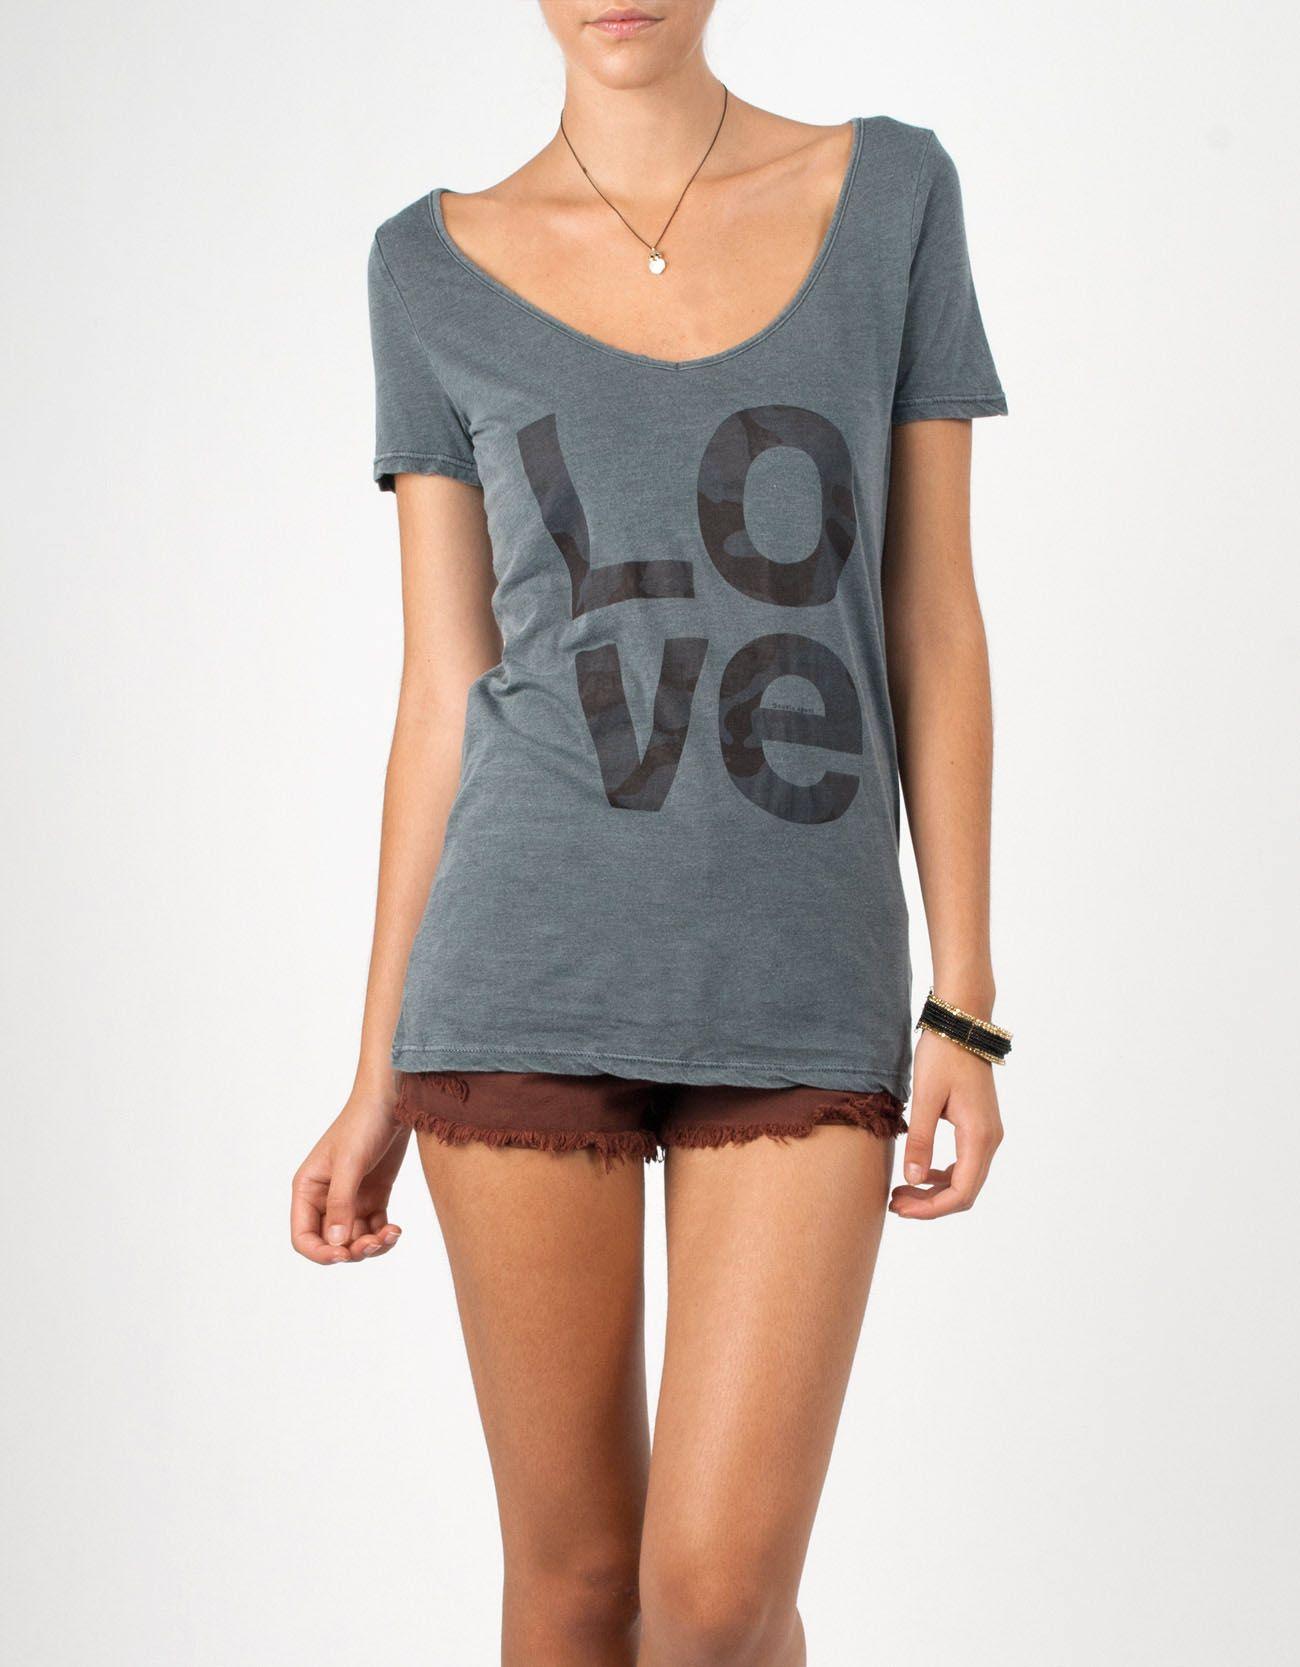 #Camiseta Double Agent #Love en gris por 16€ en www.doubleagent.es #fashion #tshirt